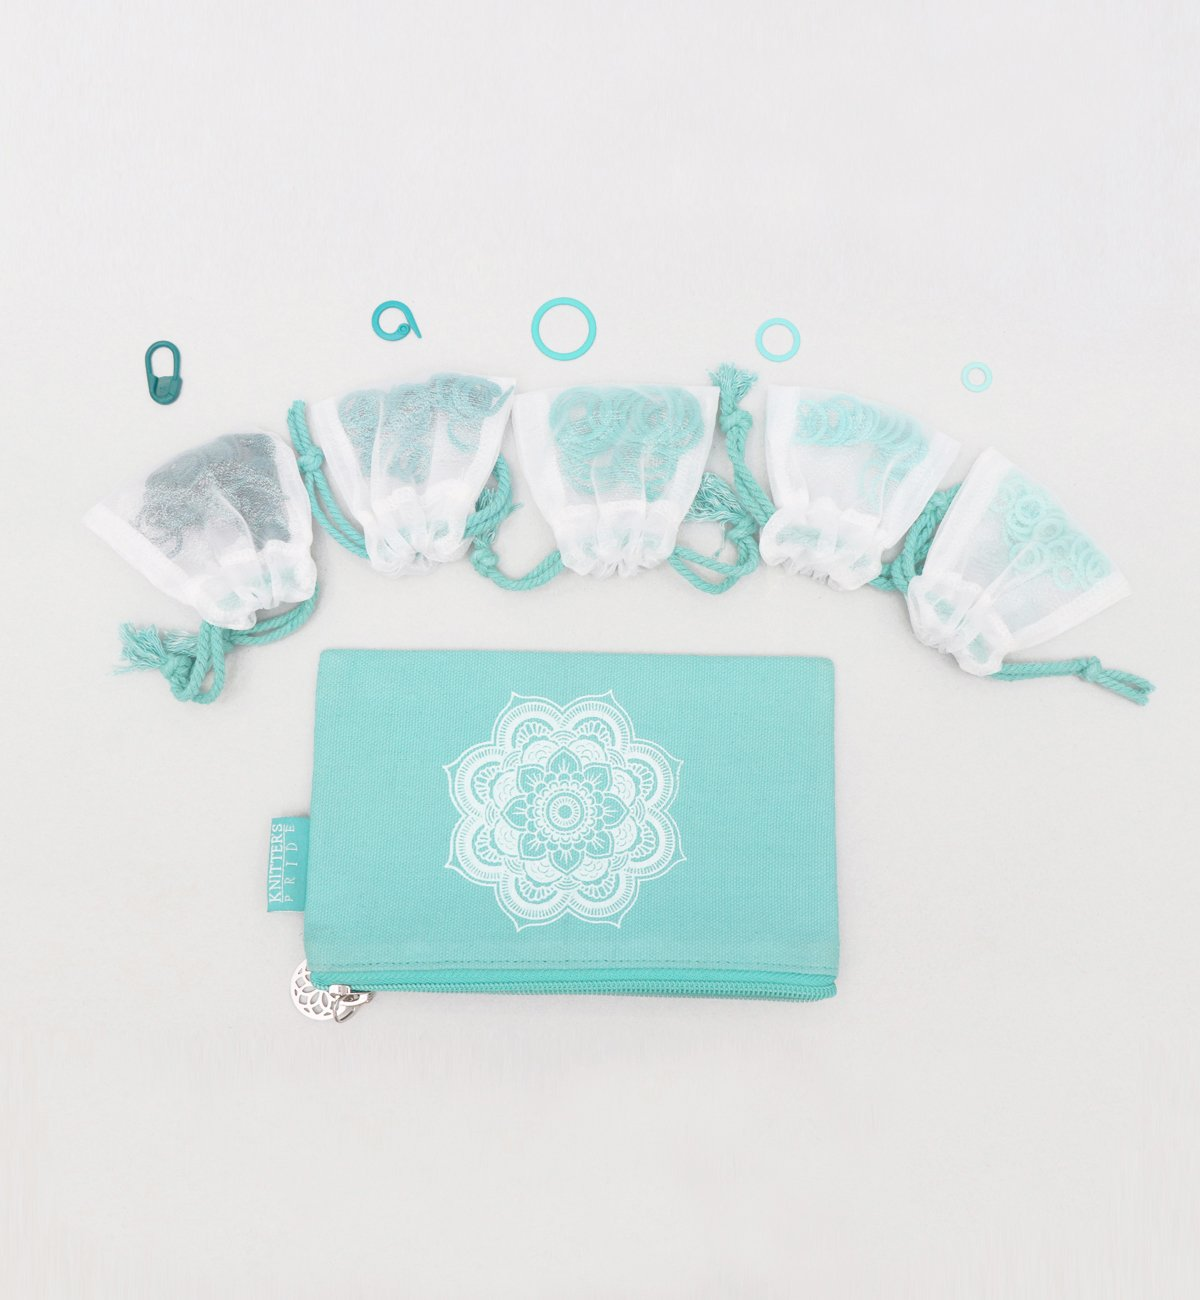 Mindful 100 Stitch Markers & Bag